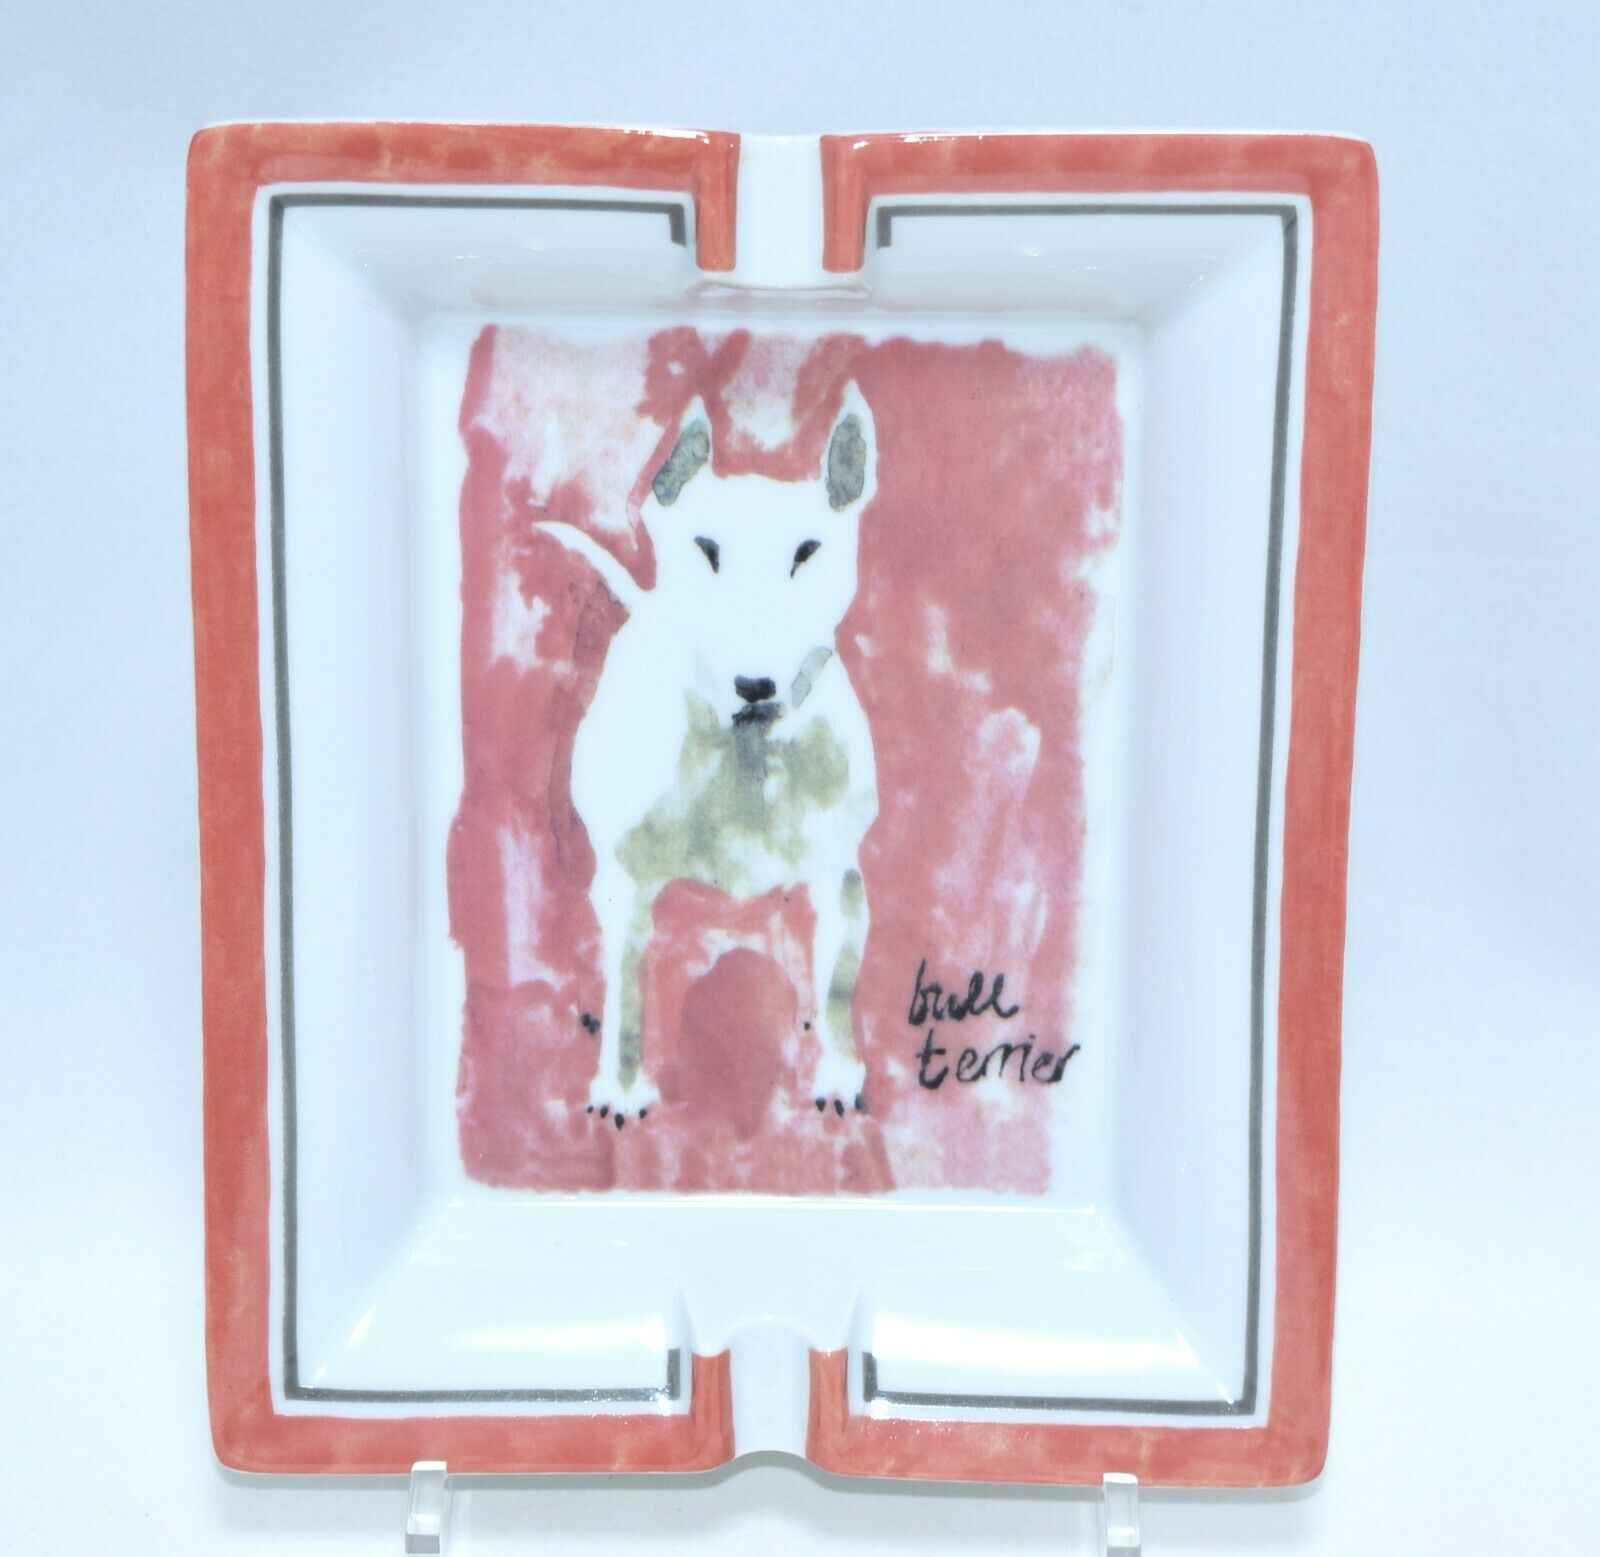 Hermes changer plateau bull terrier cendrier porcelaine dog rose vide poche arts